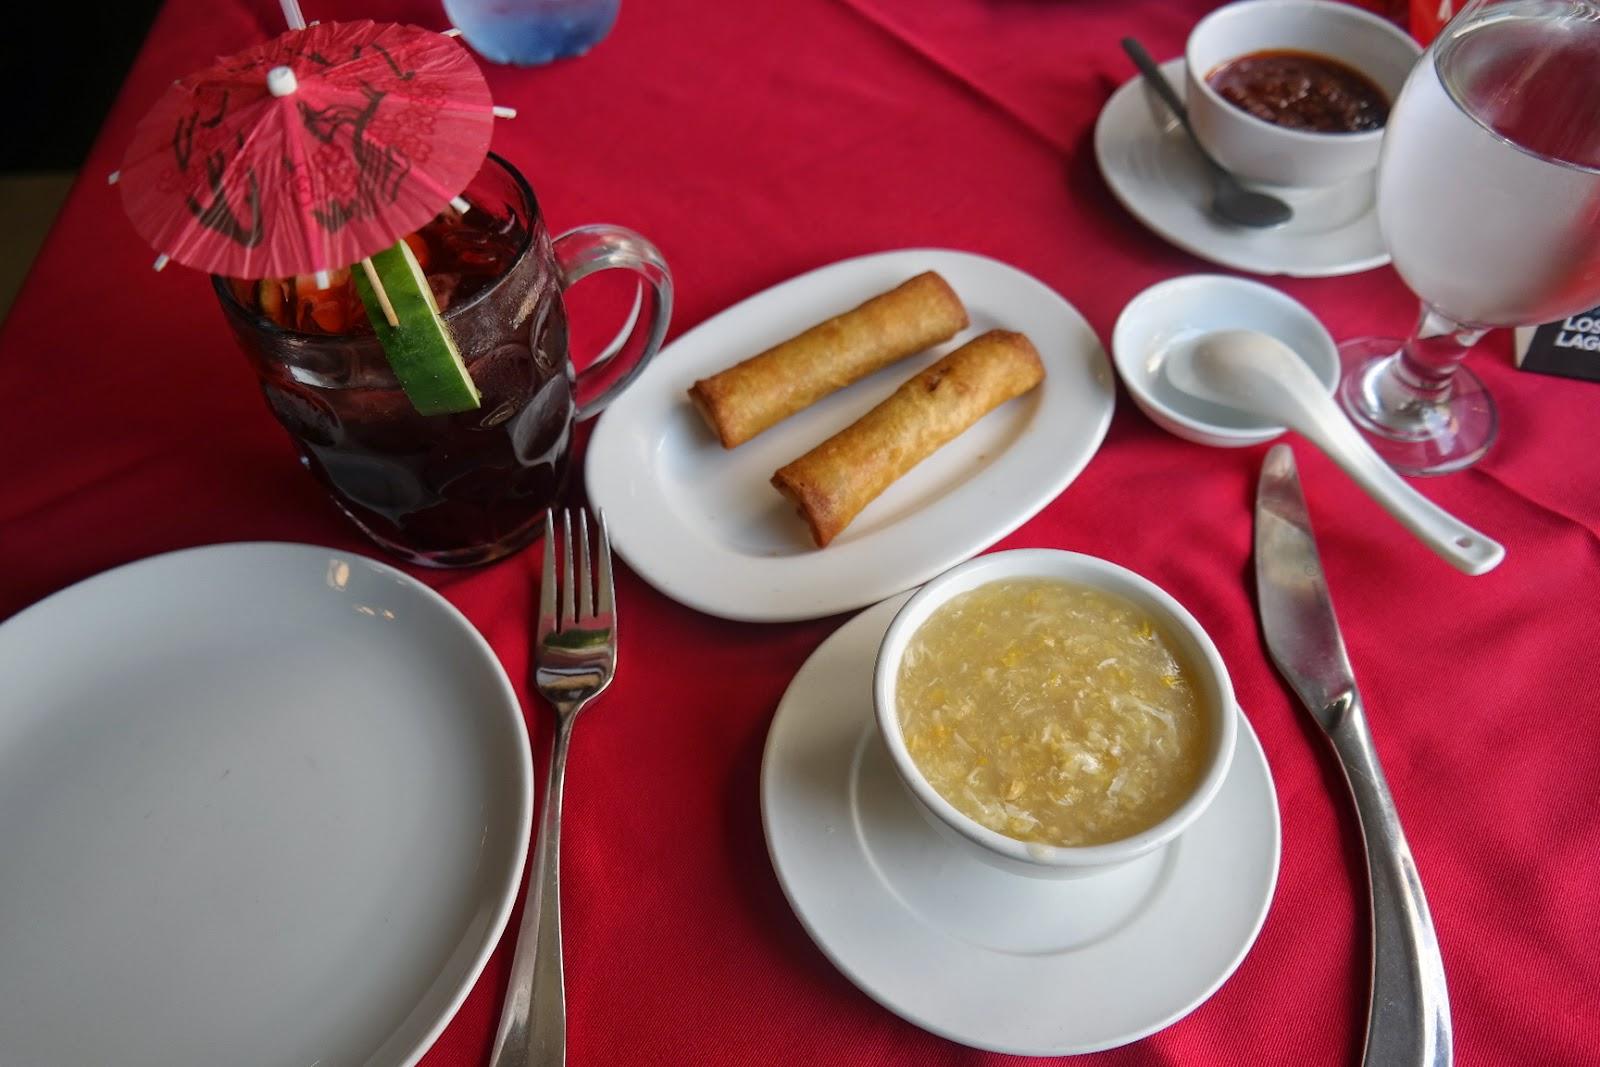 chinese food, lagos nigeria